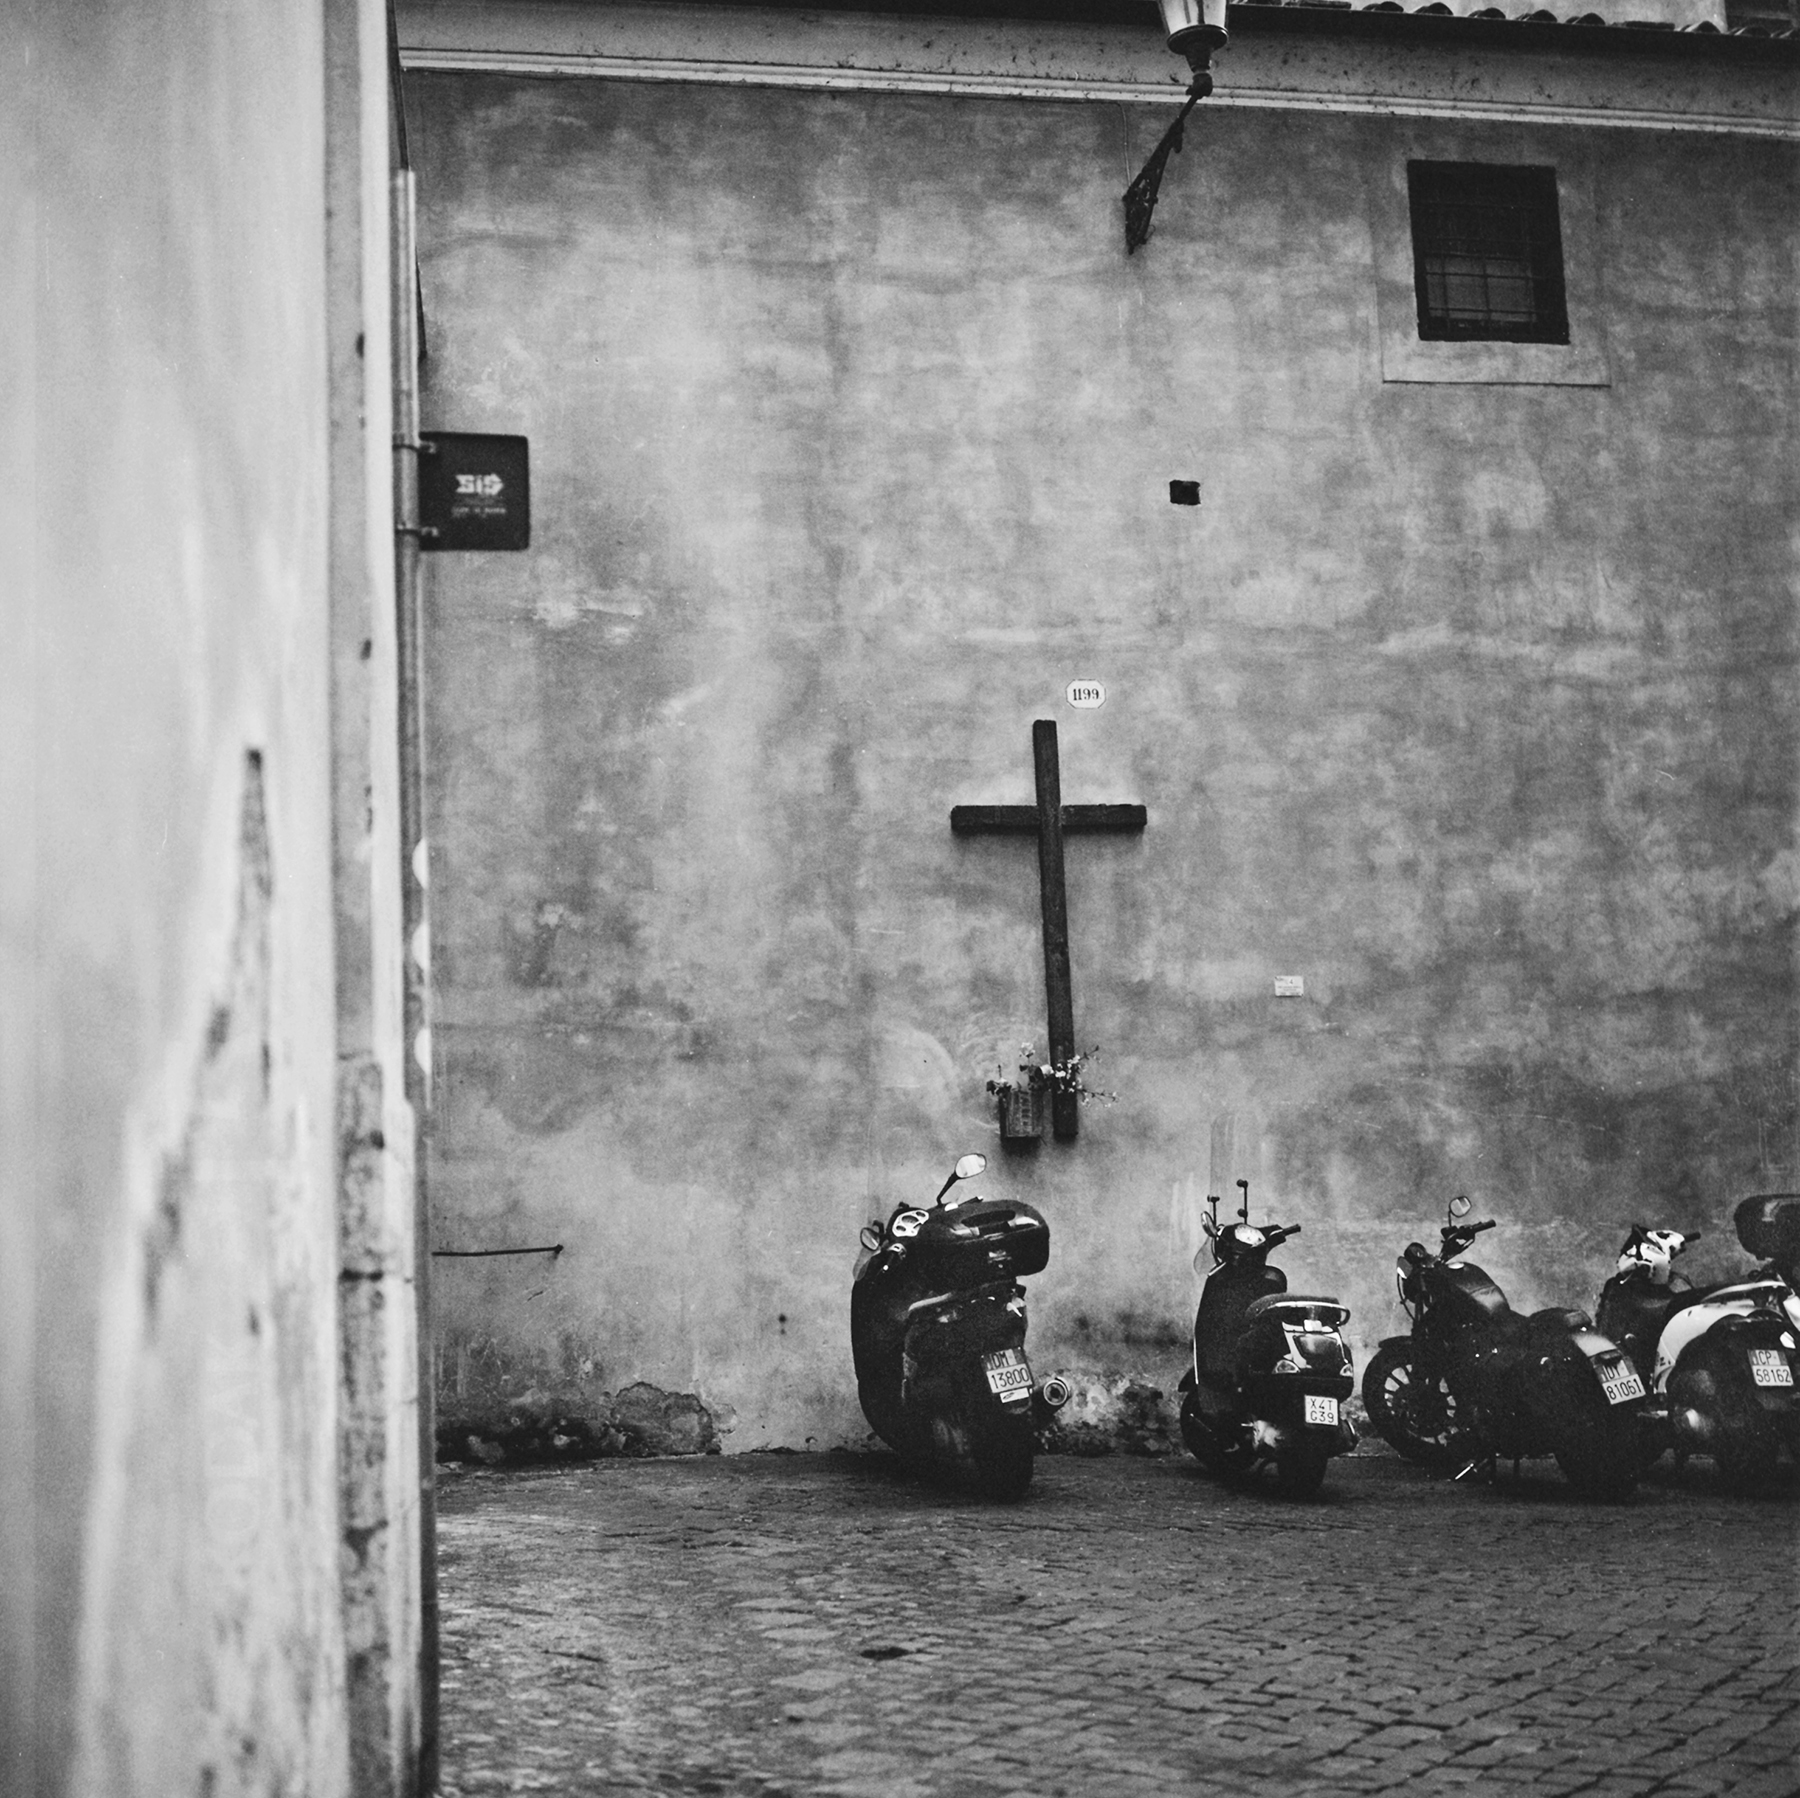 68270011 rome moto web.jpg